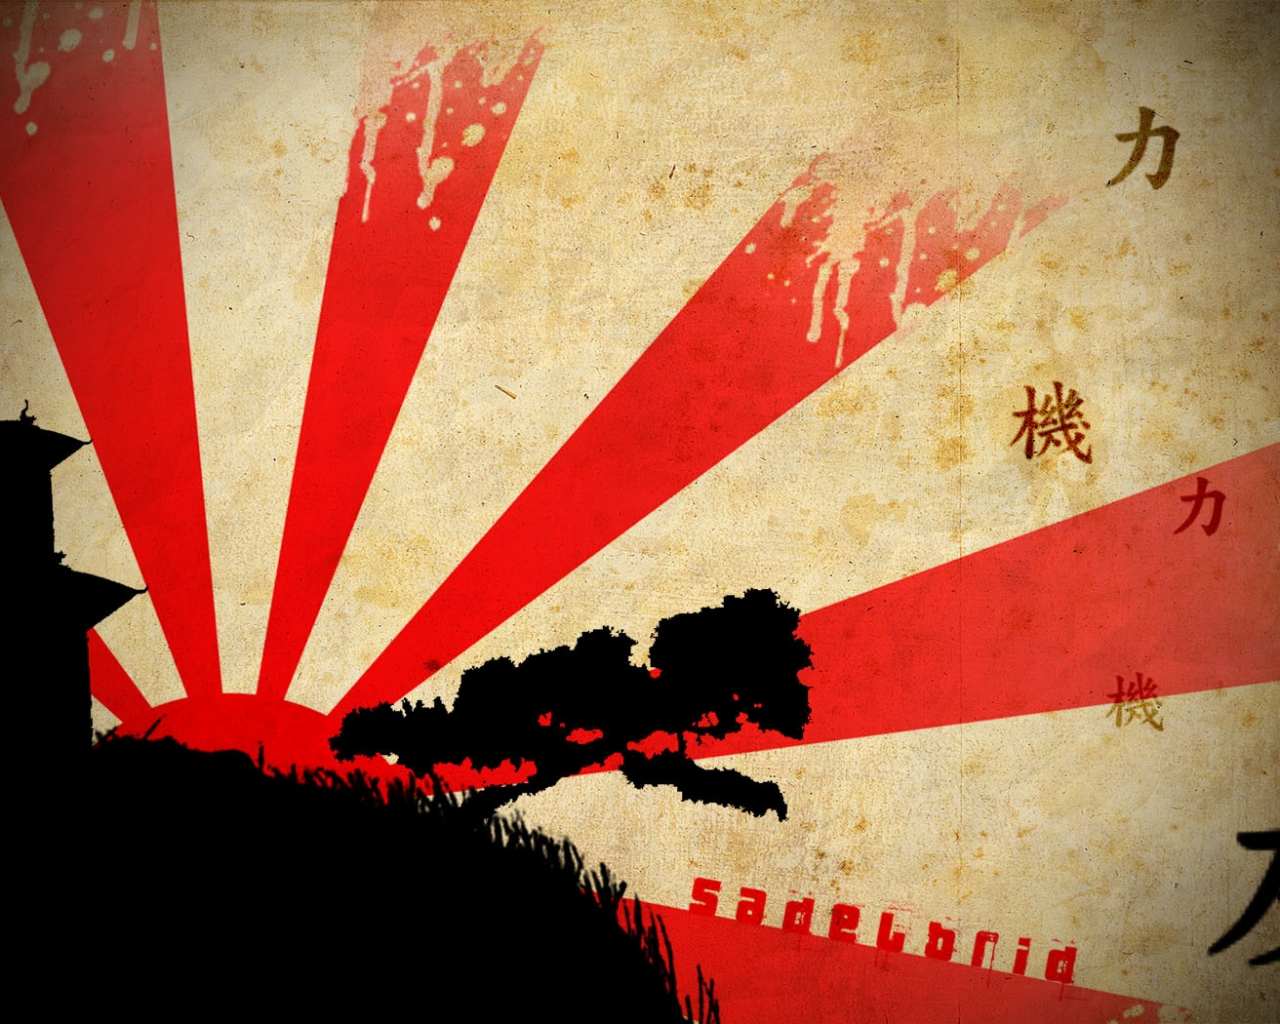 Mundo chino abstracto - 1280x1024